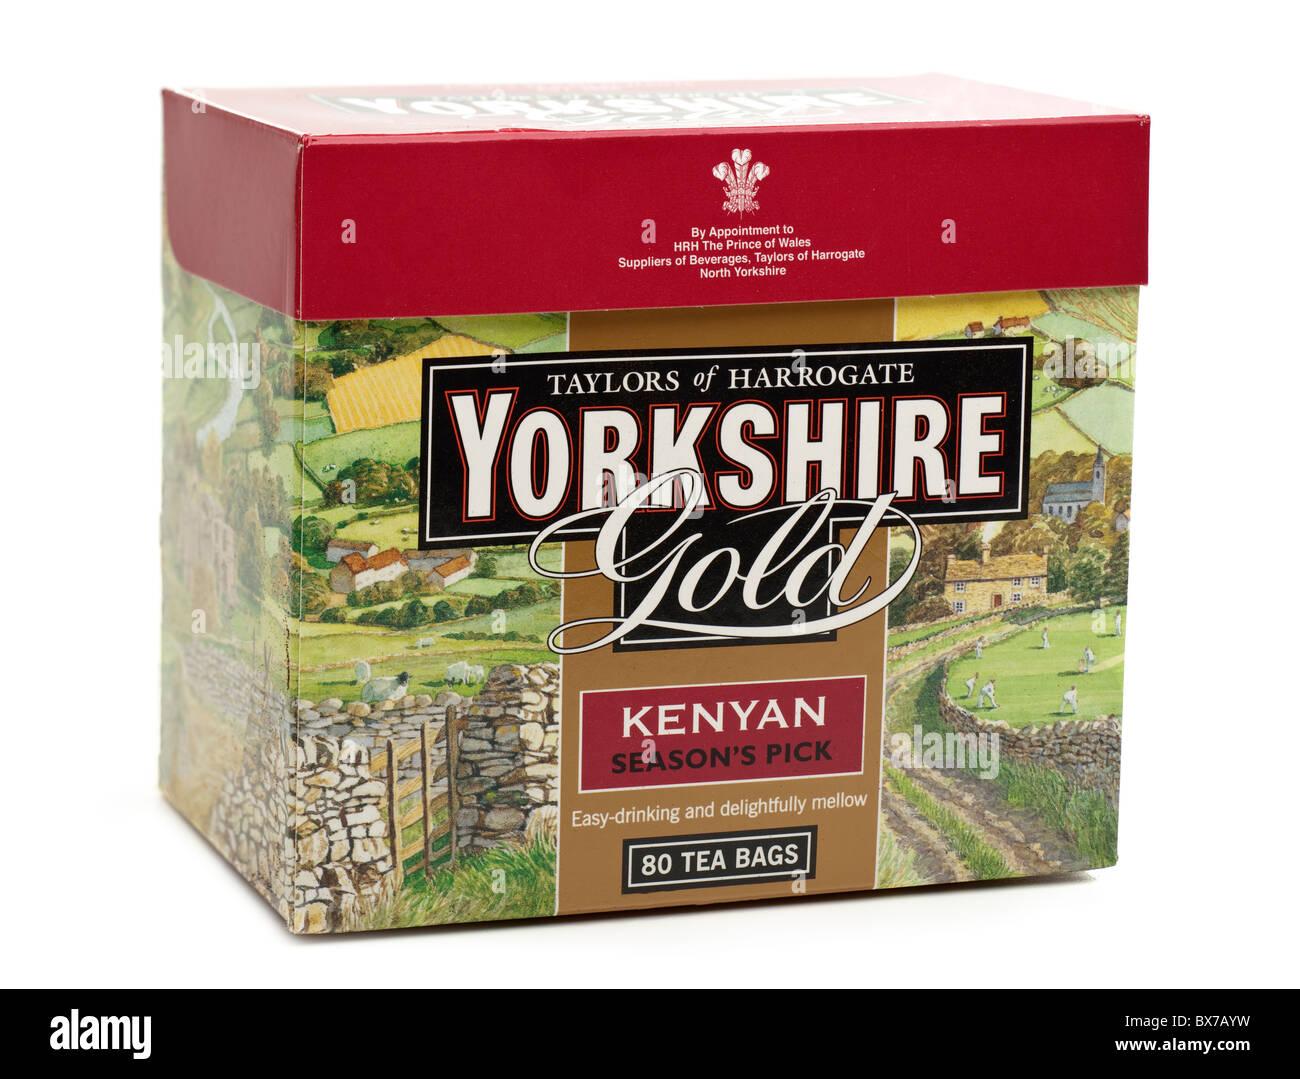 Box of 80 Kenyan Yorkshire gold tea bags - Stock Image